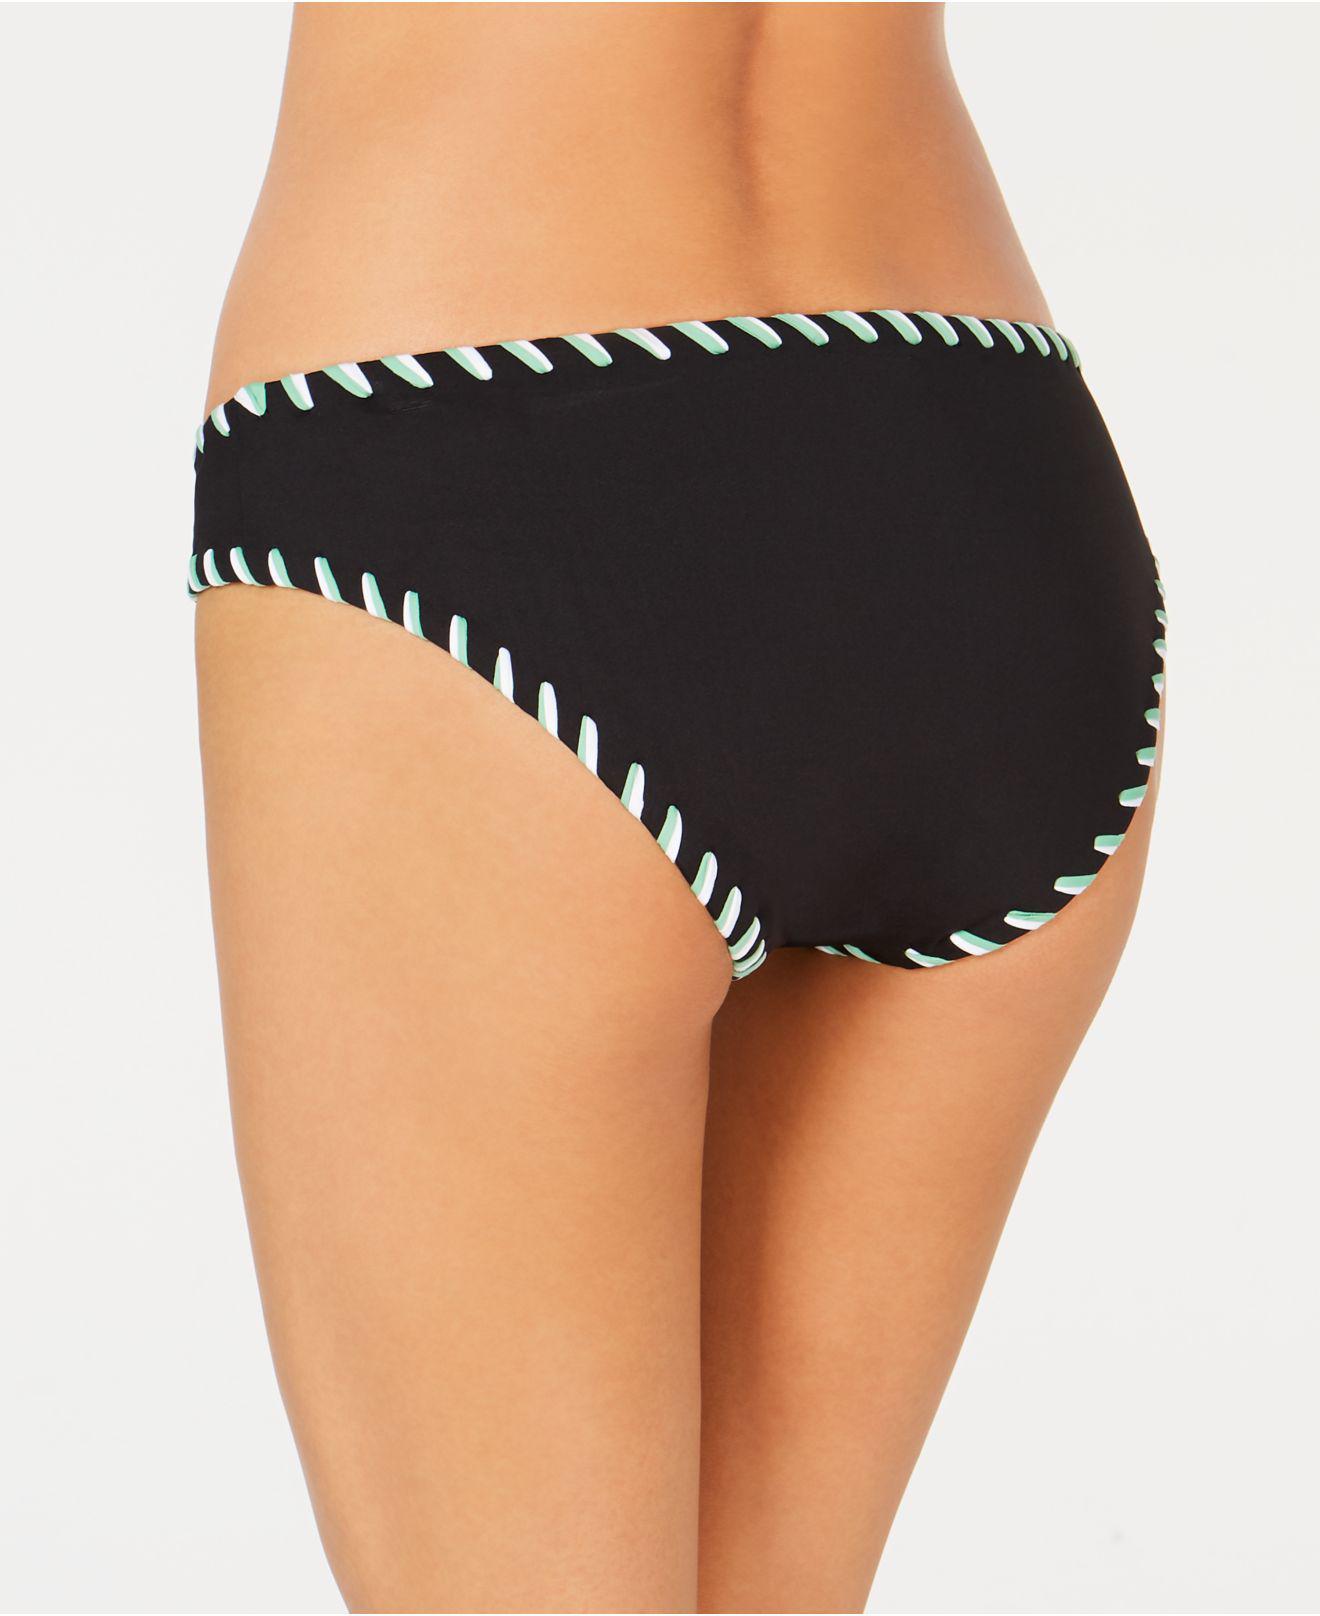 b46cb26341f1c Lyst - Becca Camille Reversible Bikini Bottoms in Black